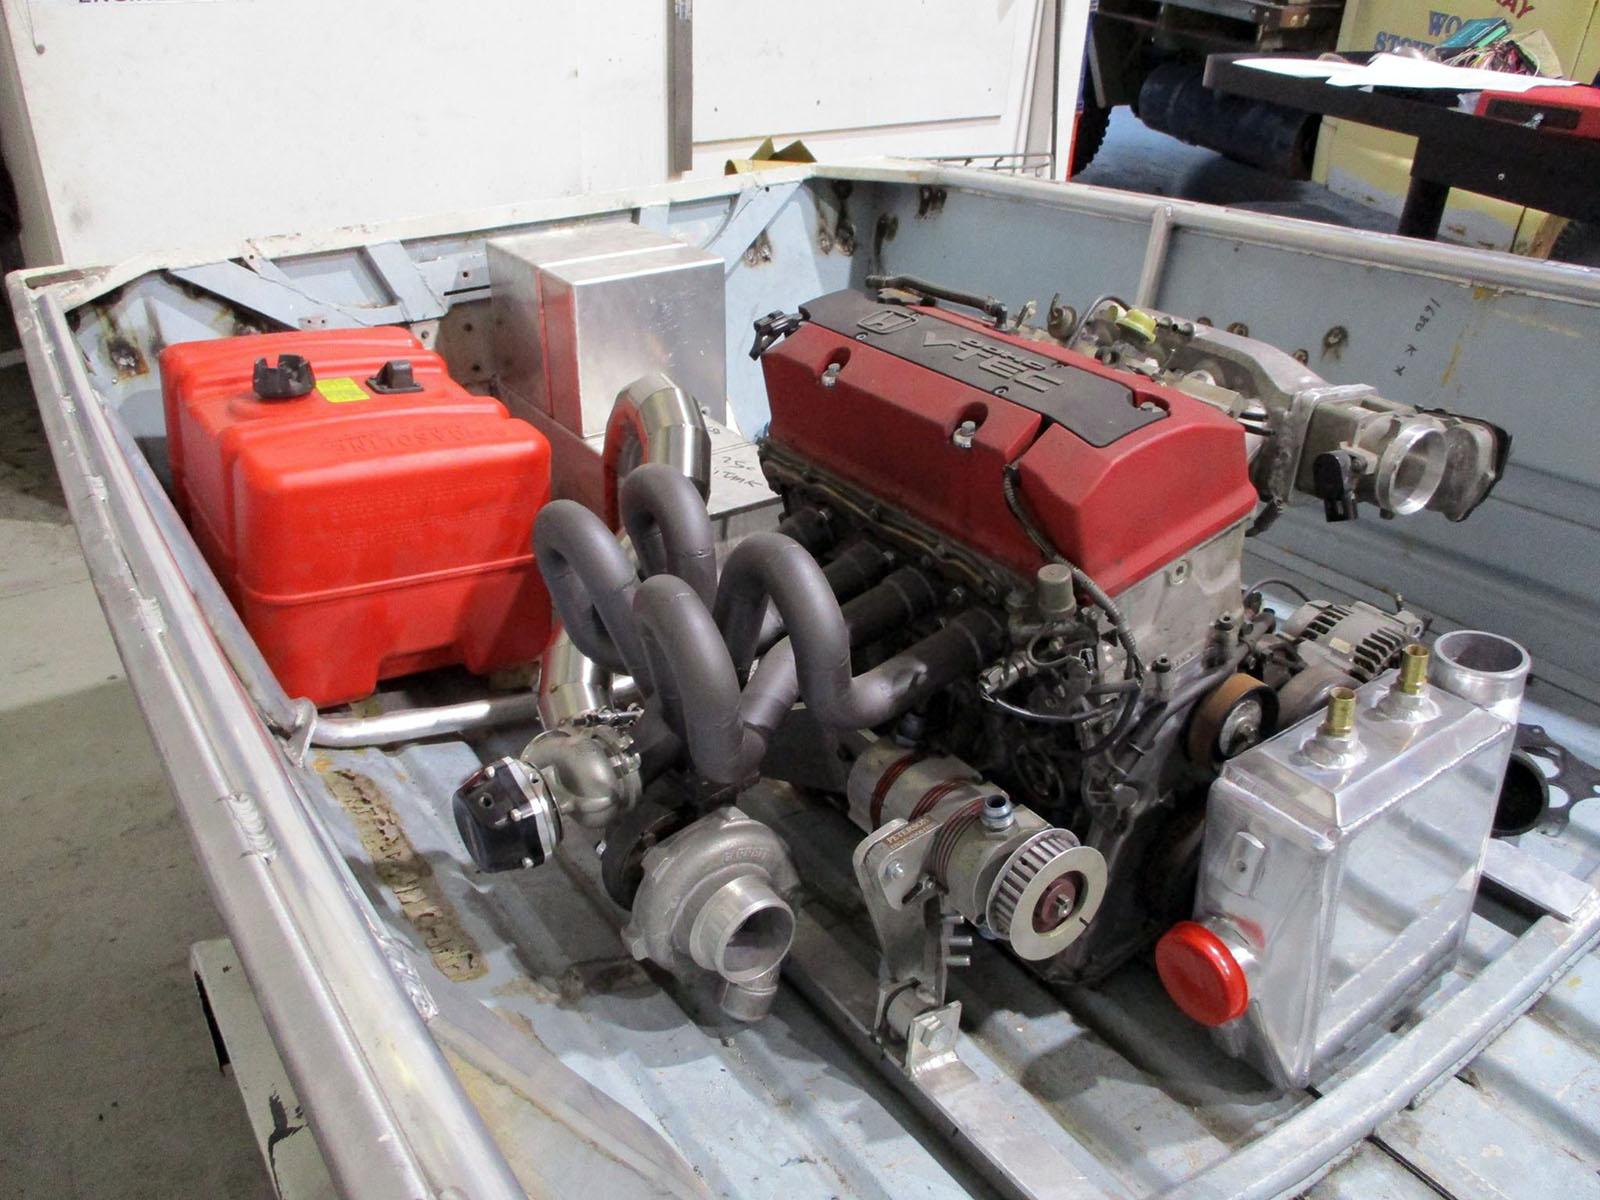 turbo f20c powered boat engine swap depot. Black Bedroom Furniture Sets. Home Design Ideas